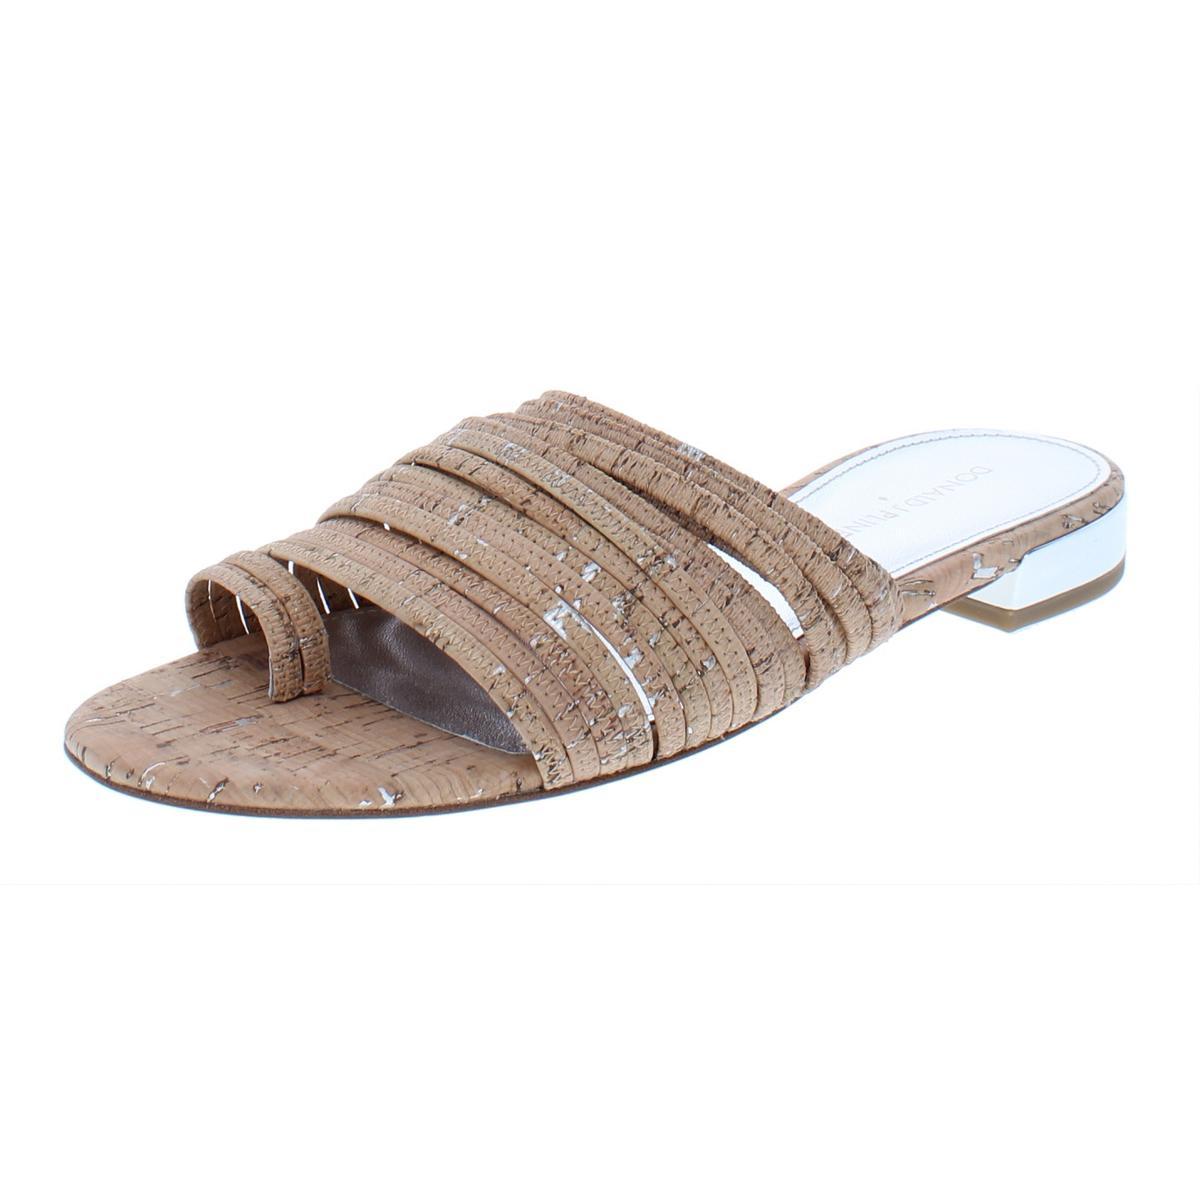 436bc51bff0 Details about Donald J. Pliner Womens Frea Tan Metallic Slide Sandals Flats  9.5 9 BHFO 9375